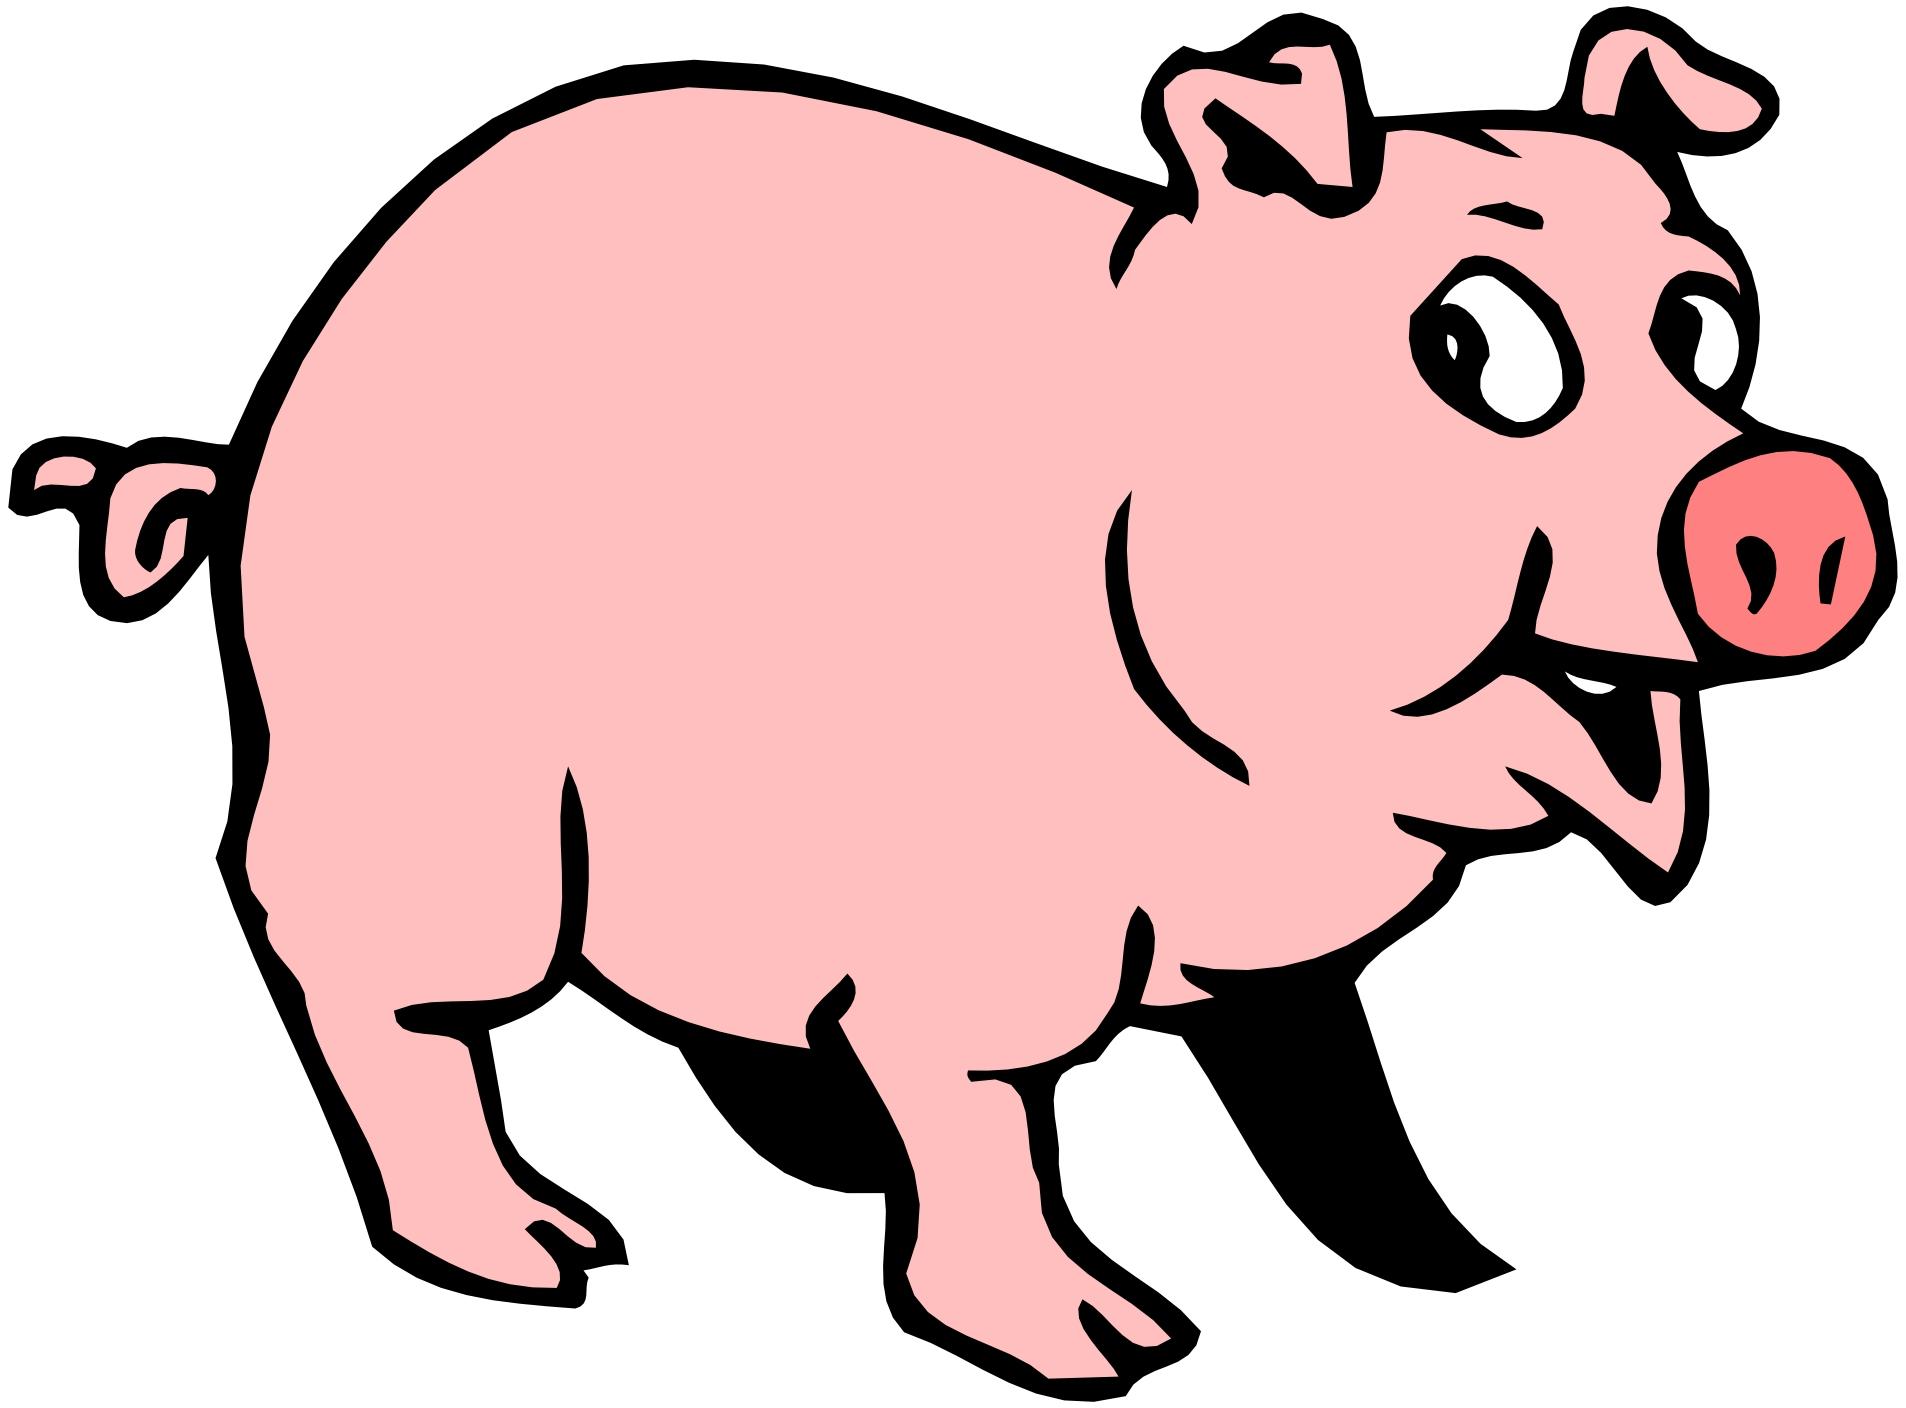 Free 2 Cartoon Pigs, Download Free Clip Art, Free Clip Art.